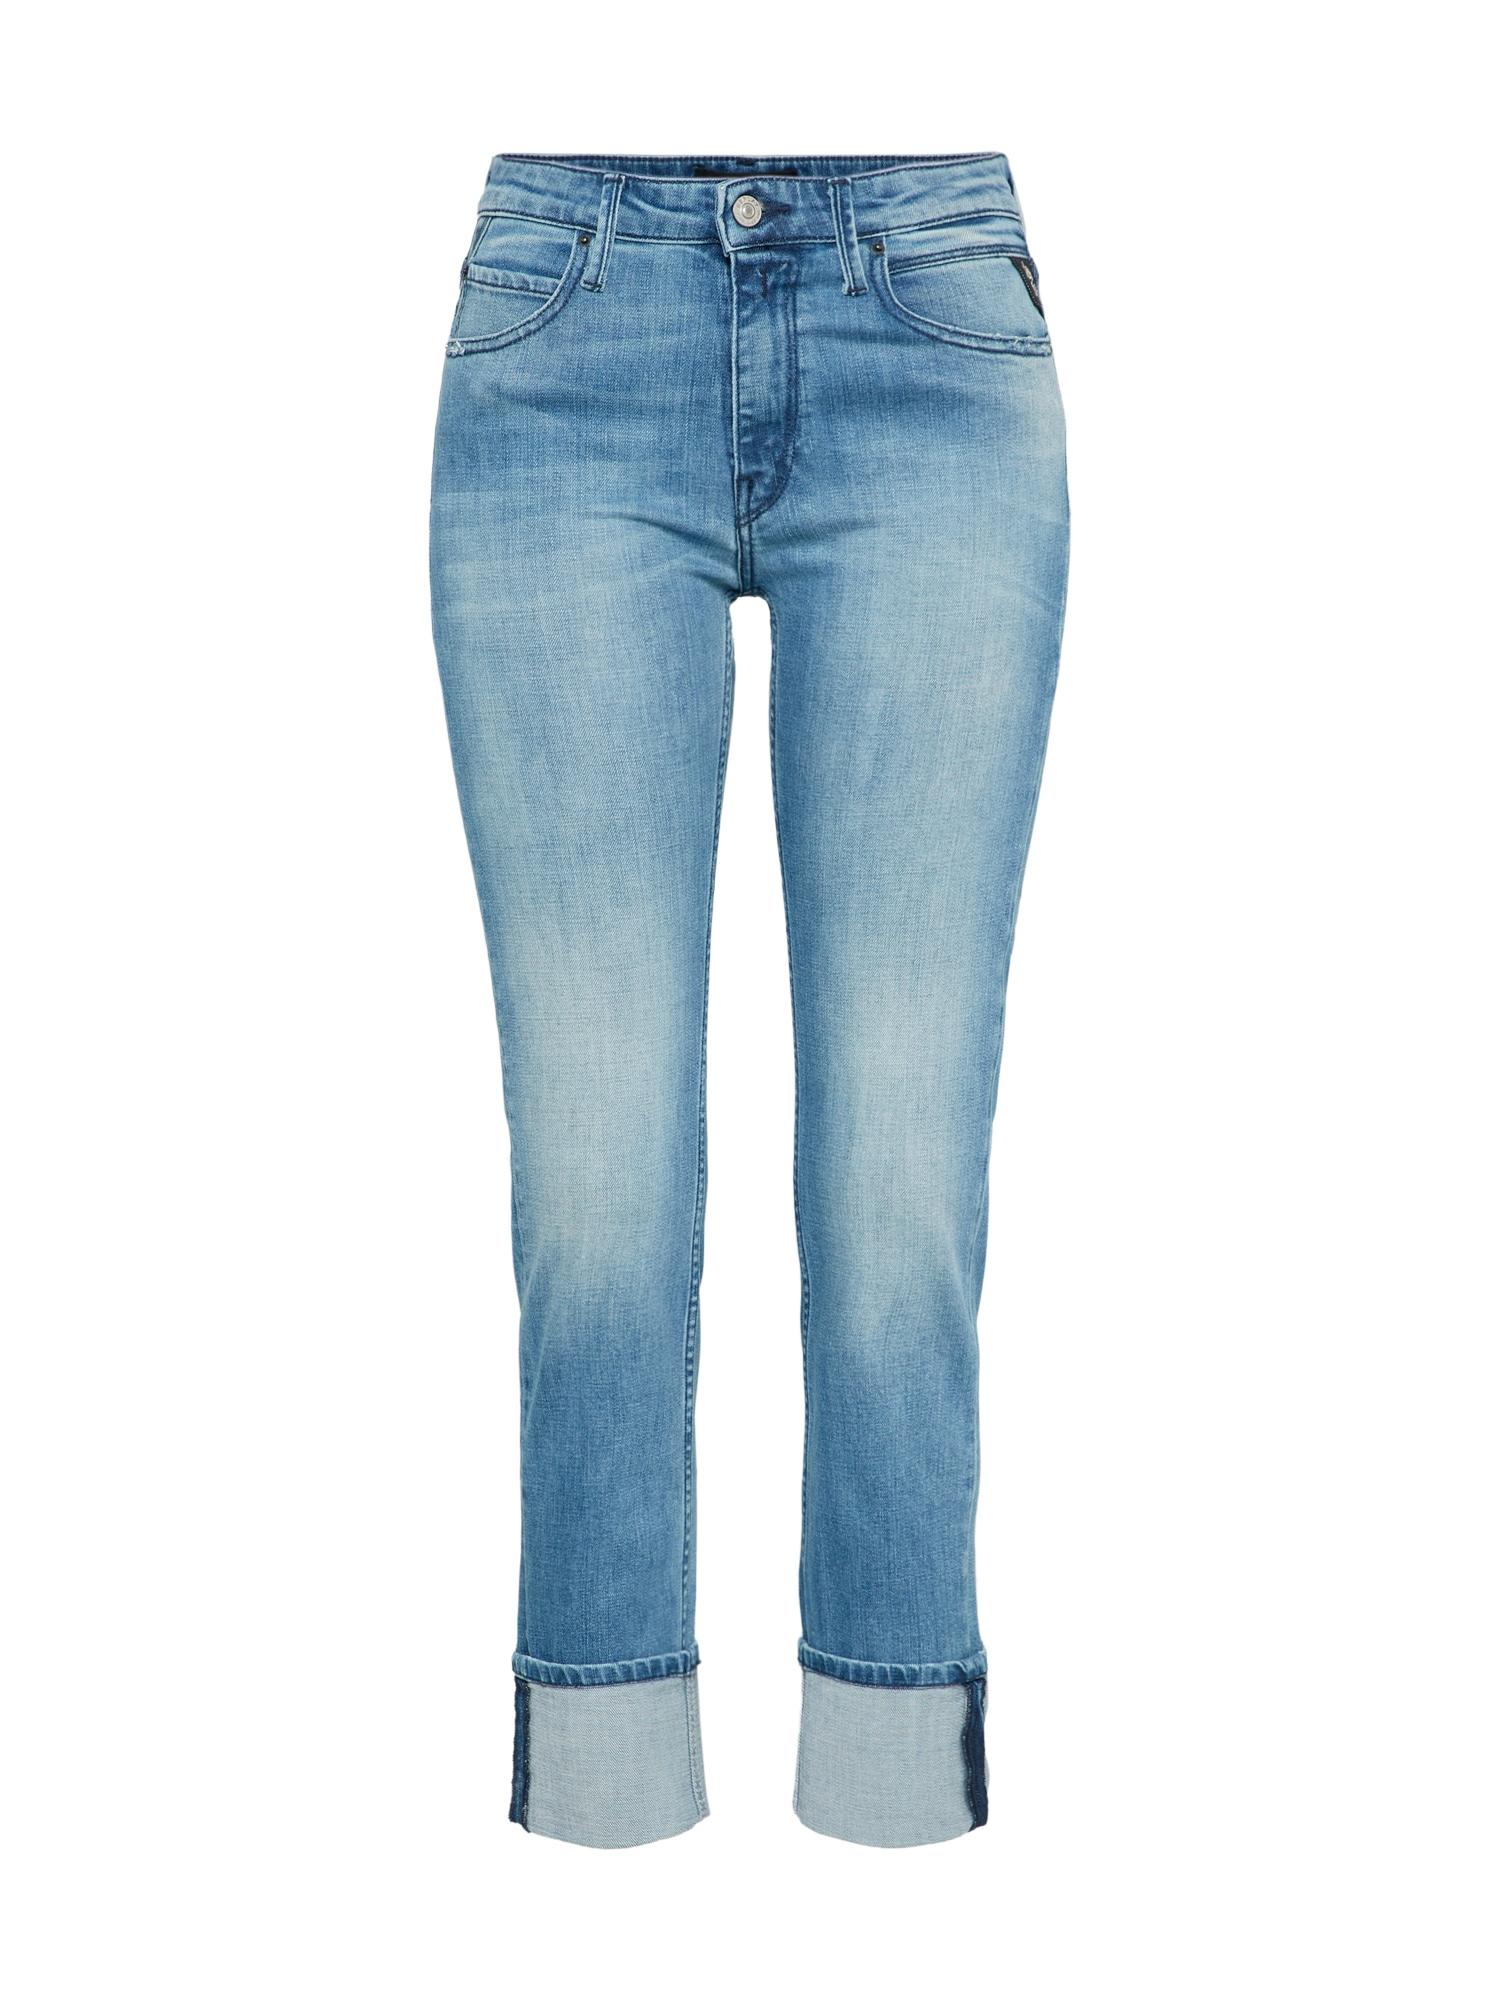 REPLAY Dames Jeans Jengre blauw denim